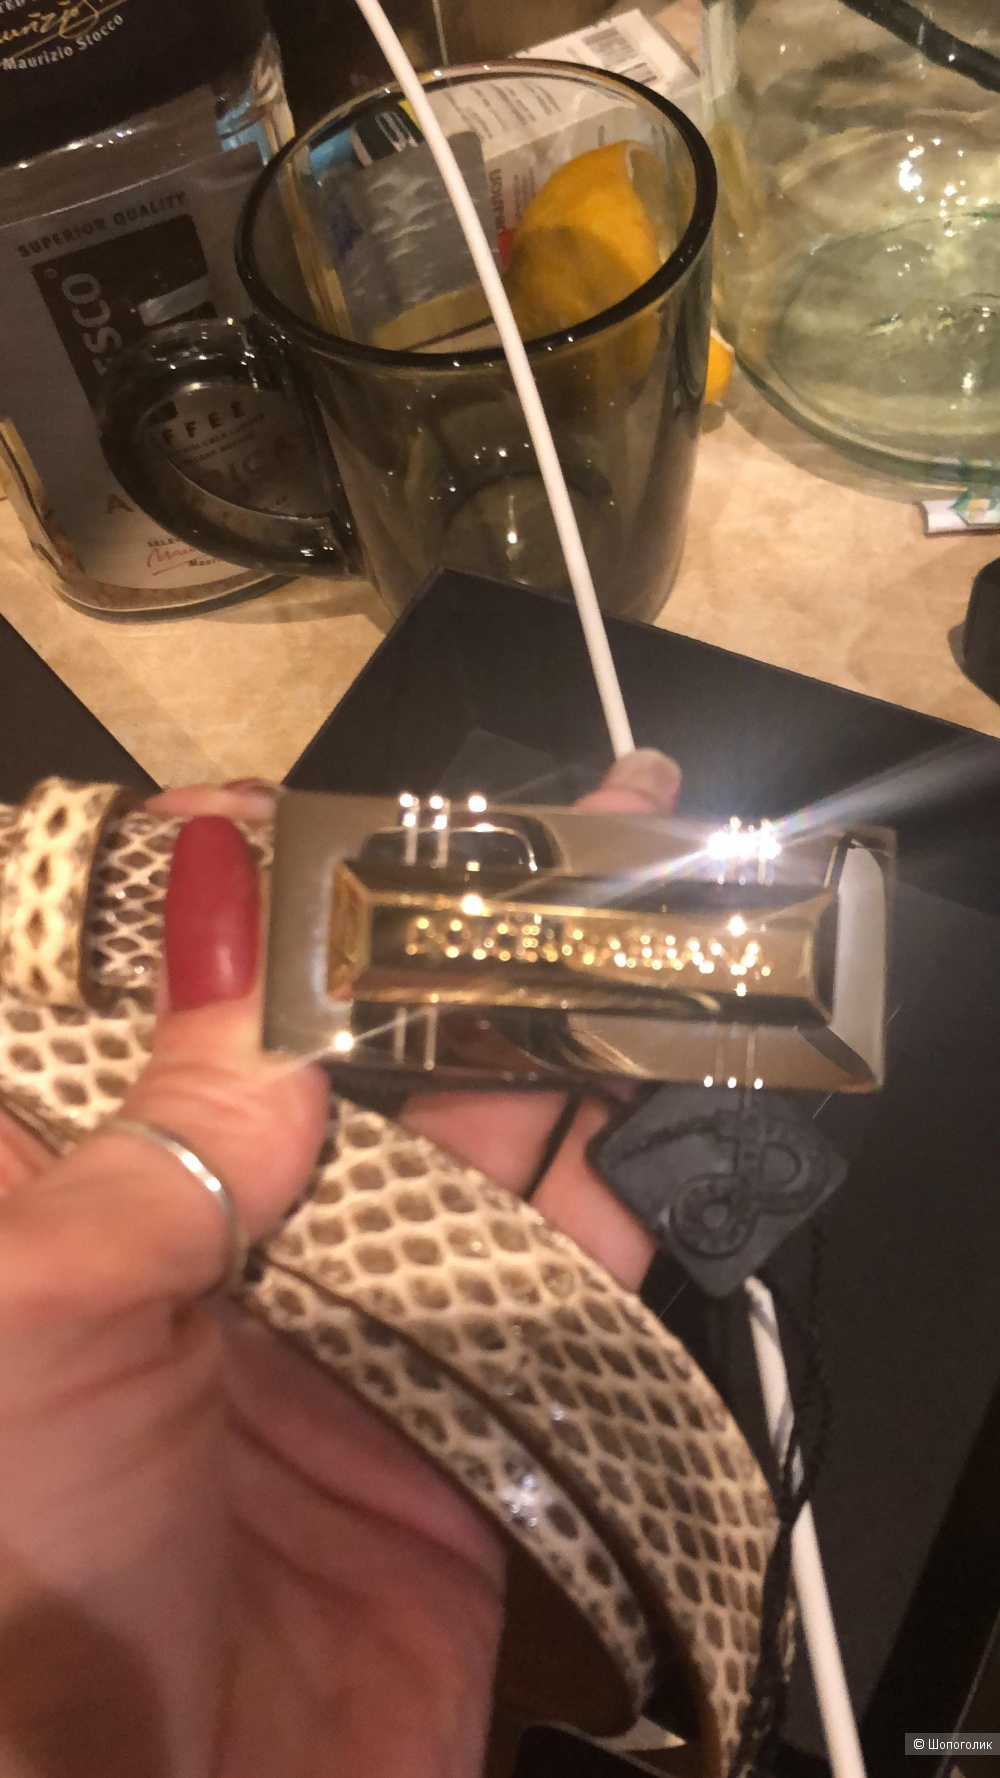 Ремень Dolce&Gabbana 90 см